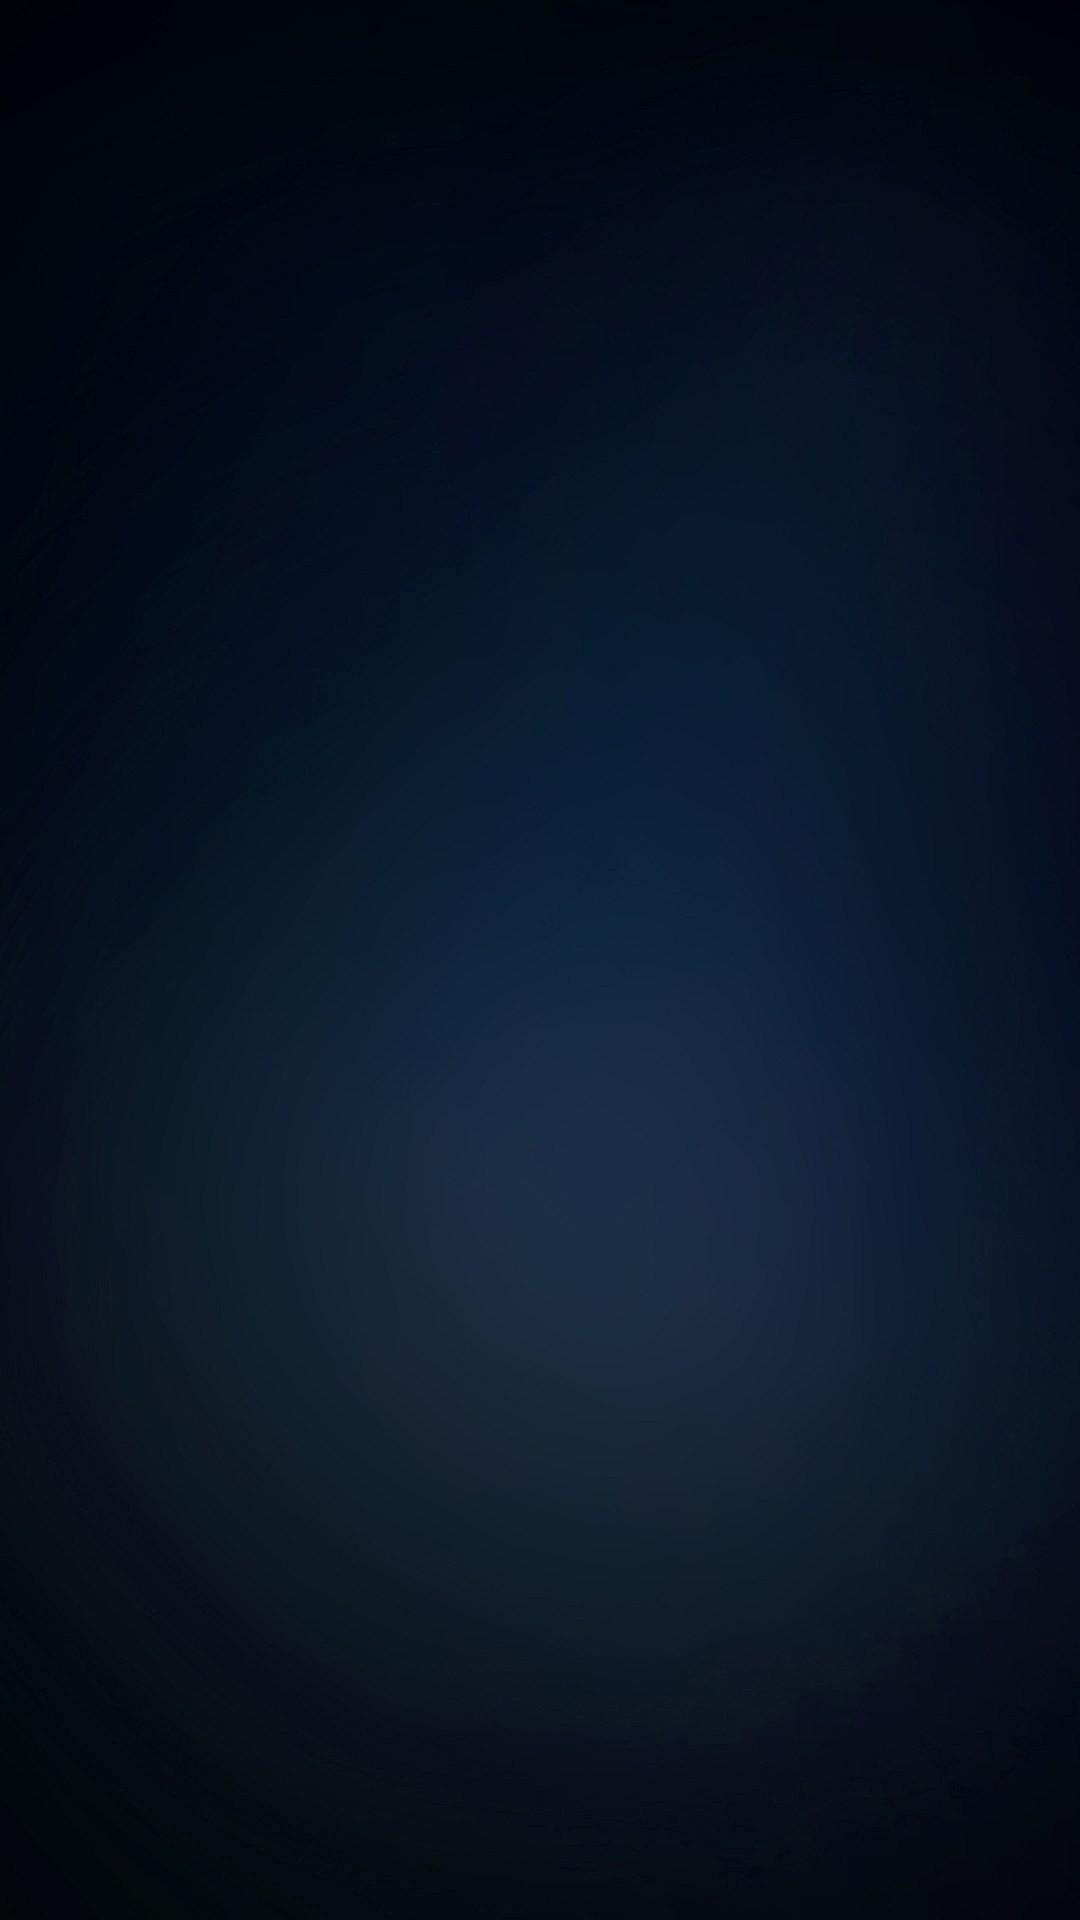 Xiaomi Mi 5 Stock Wallpapers …